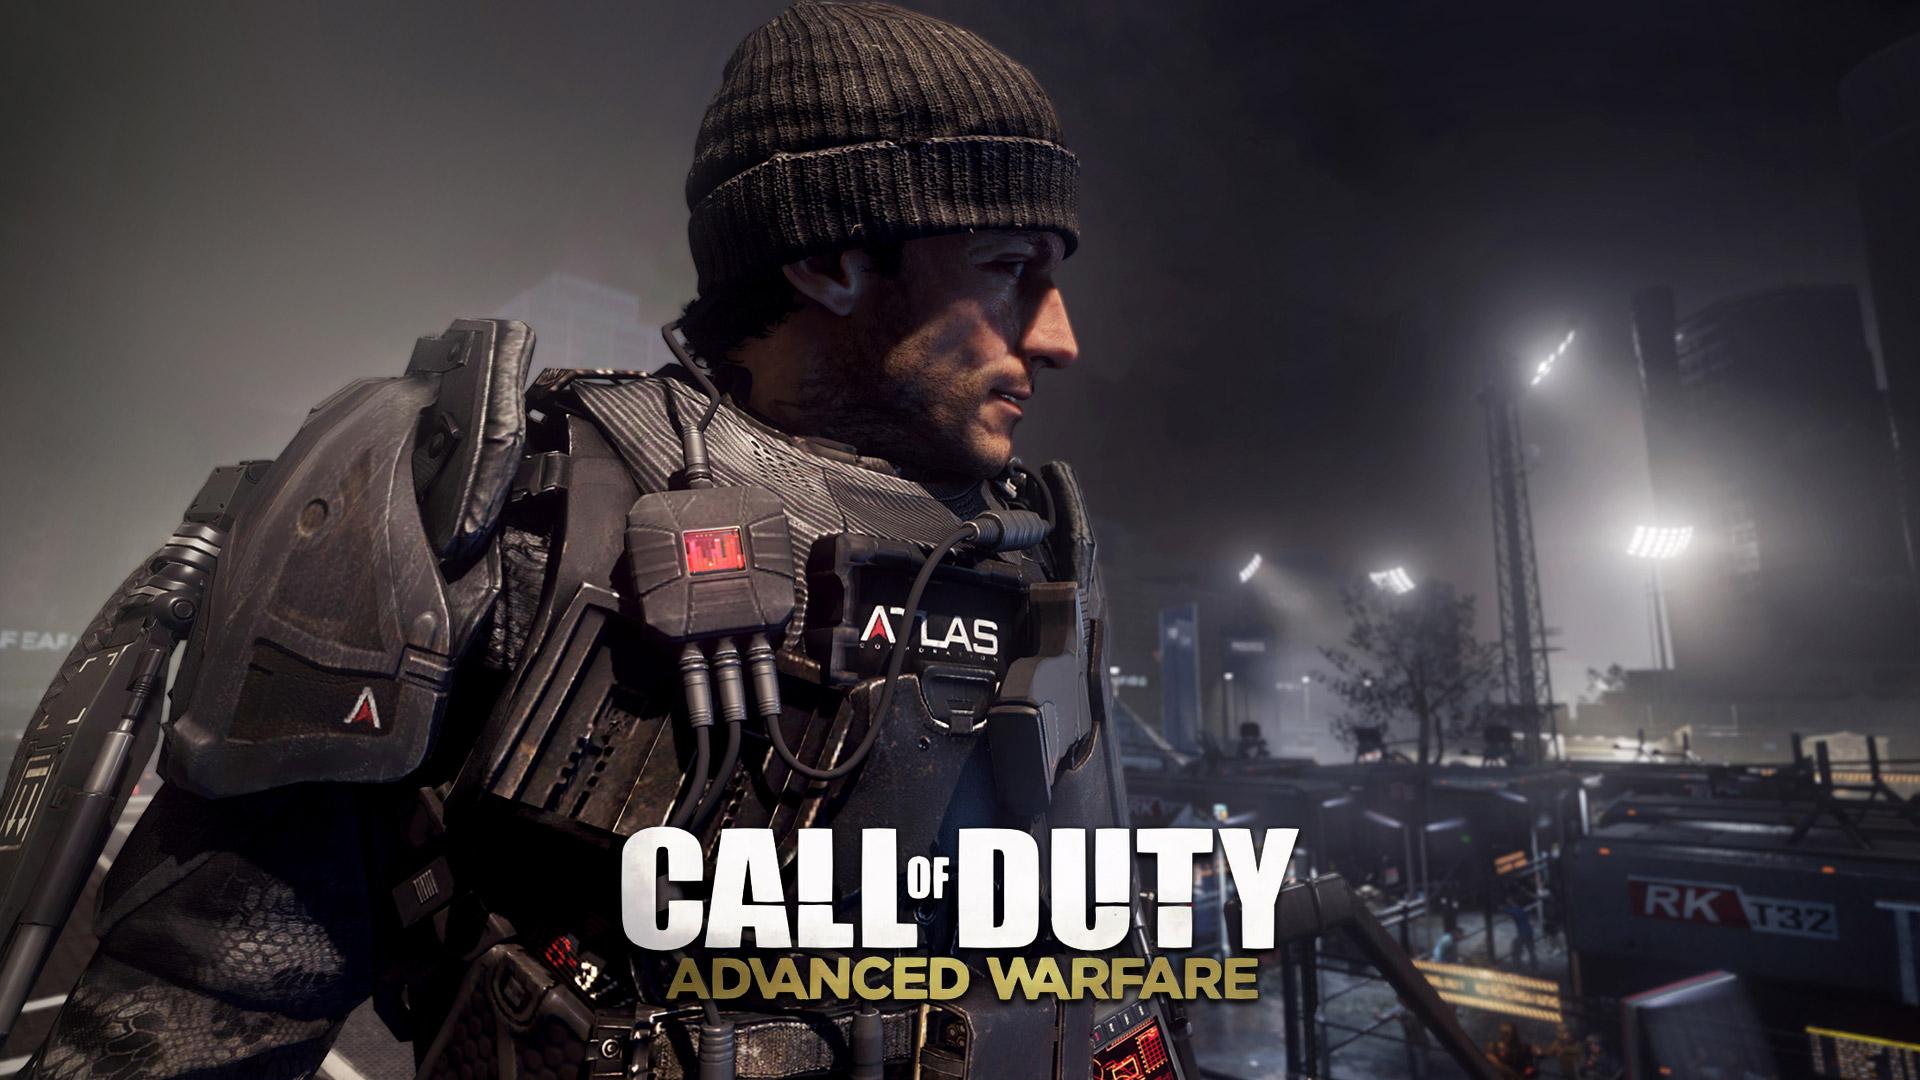 Call of Duty Advanced Warfare wallpaper 1